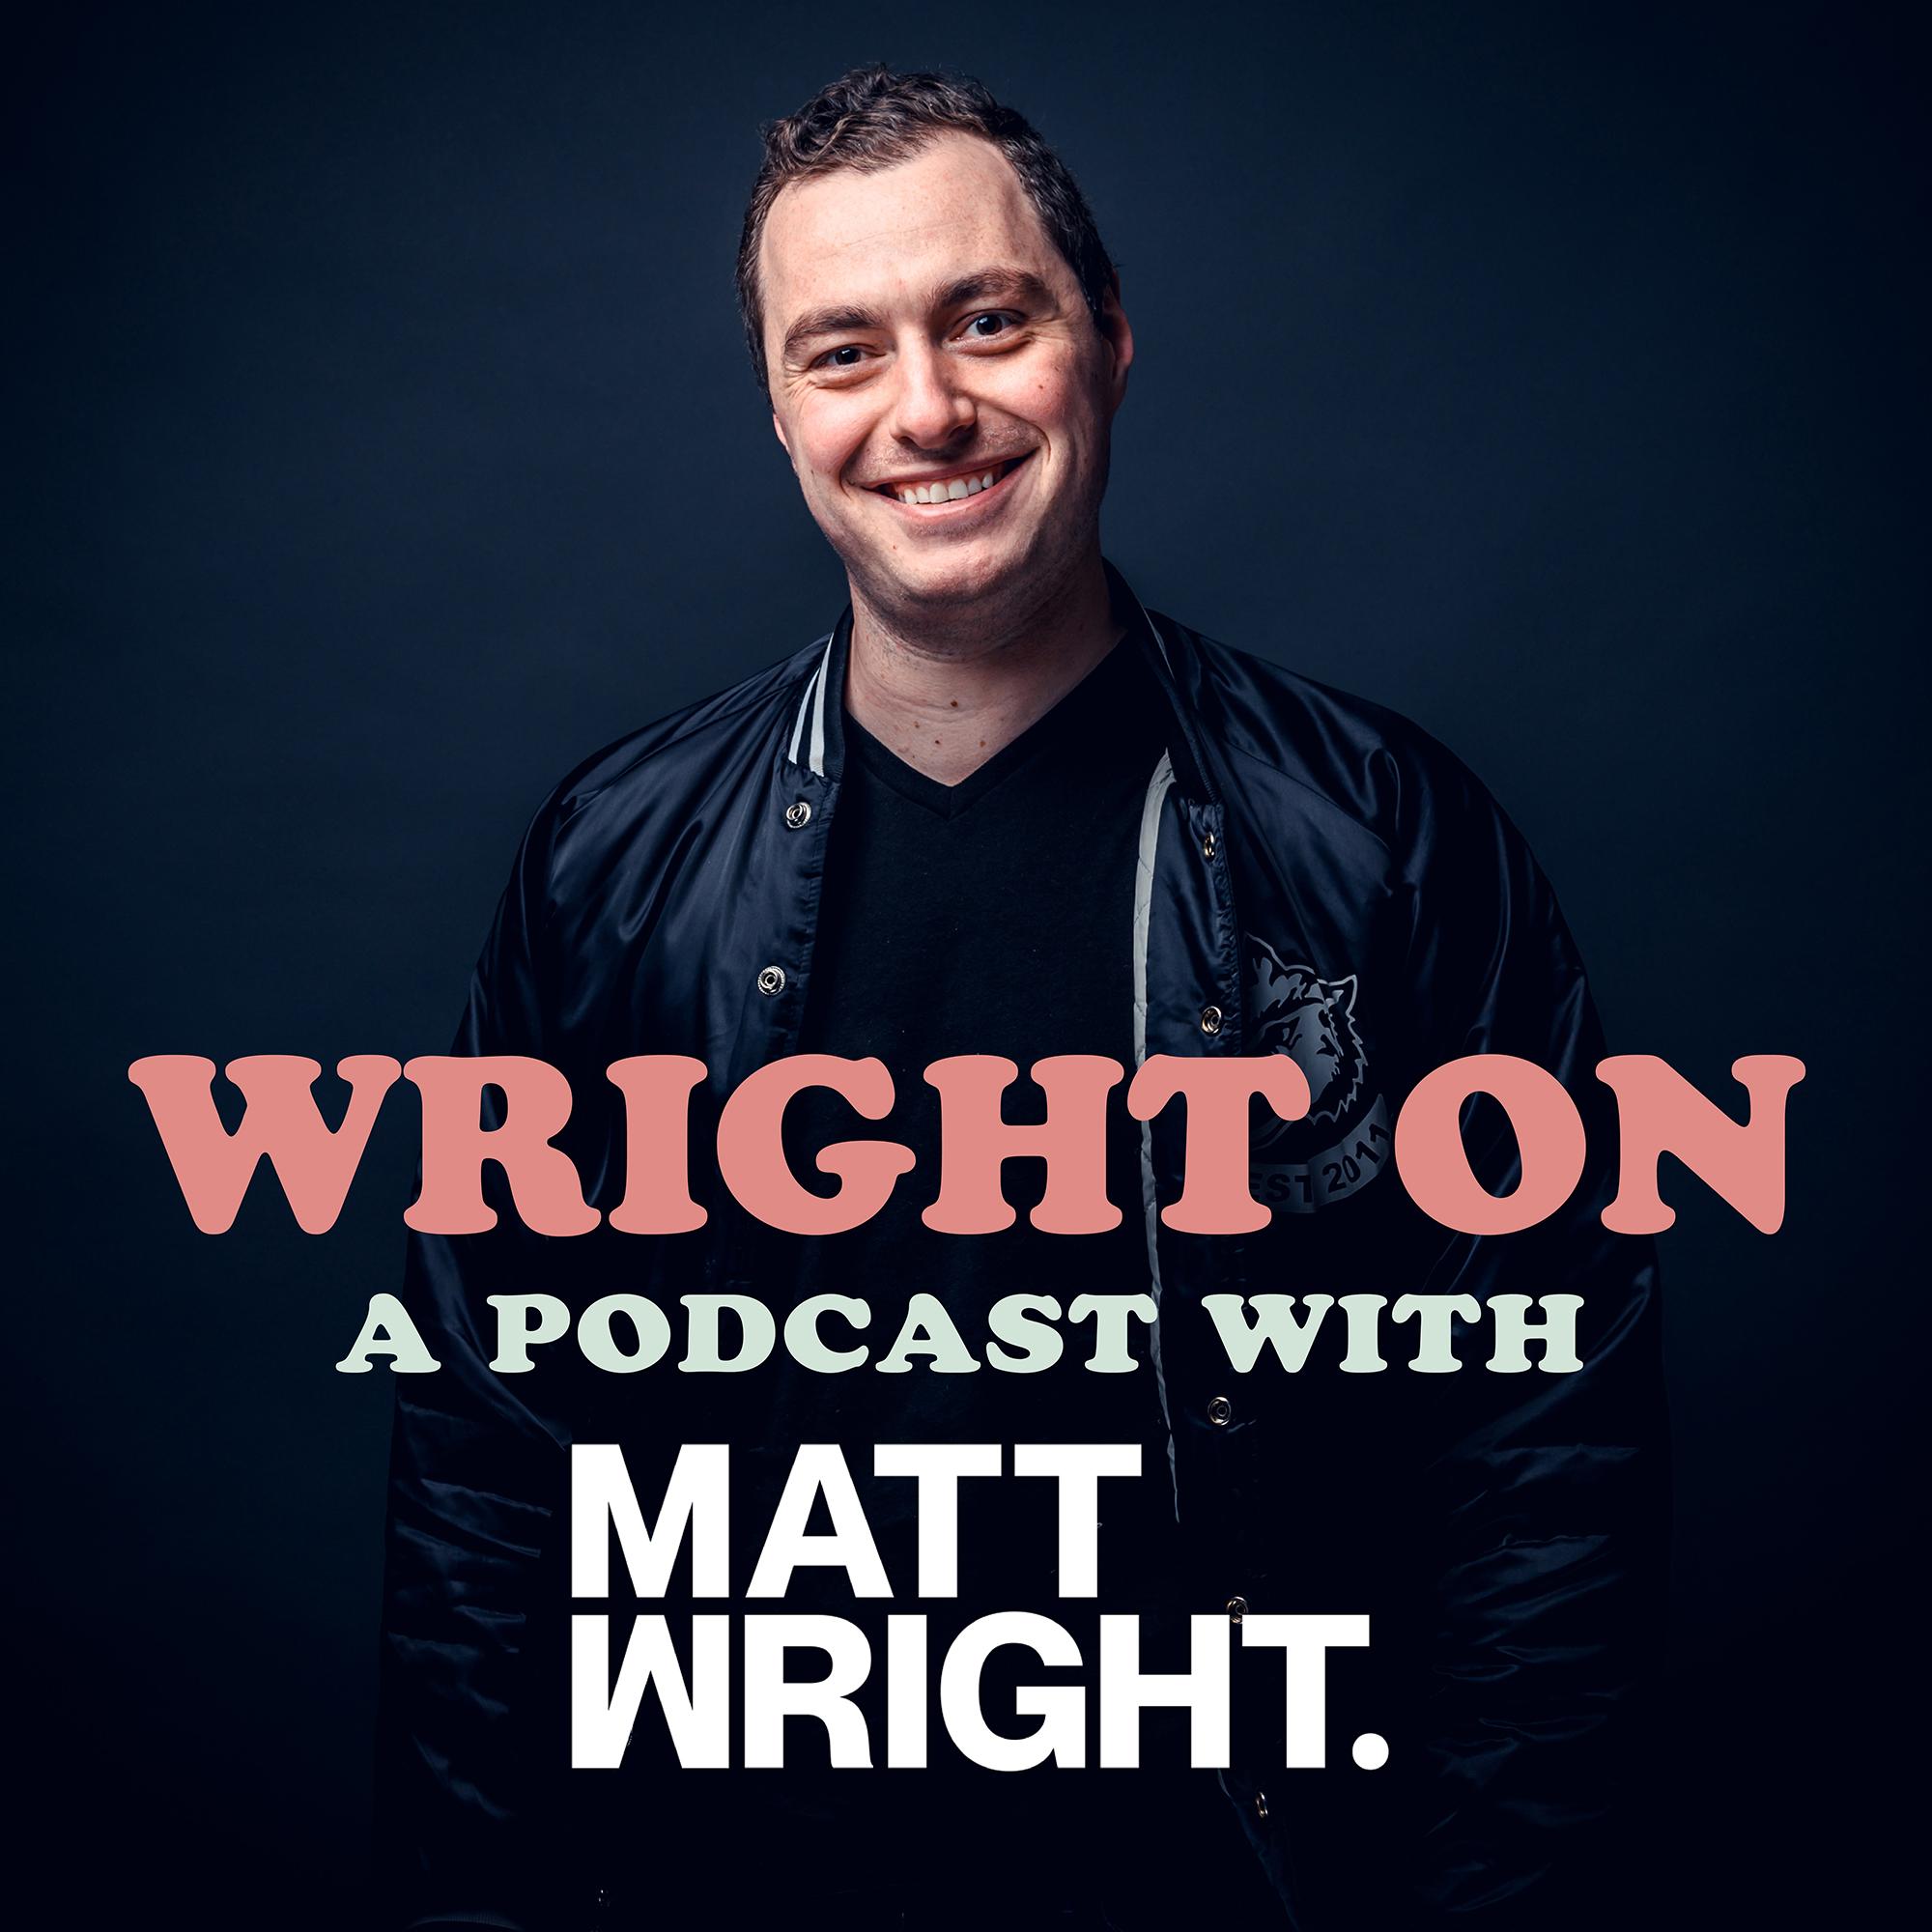 MattWright-WrightOnPodcast-Logo-SMALL.jpg